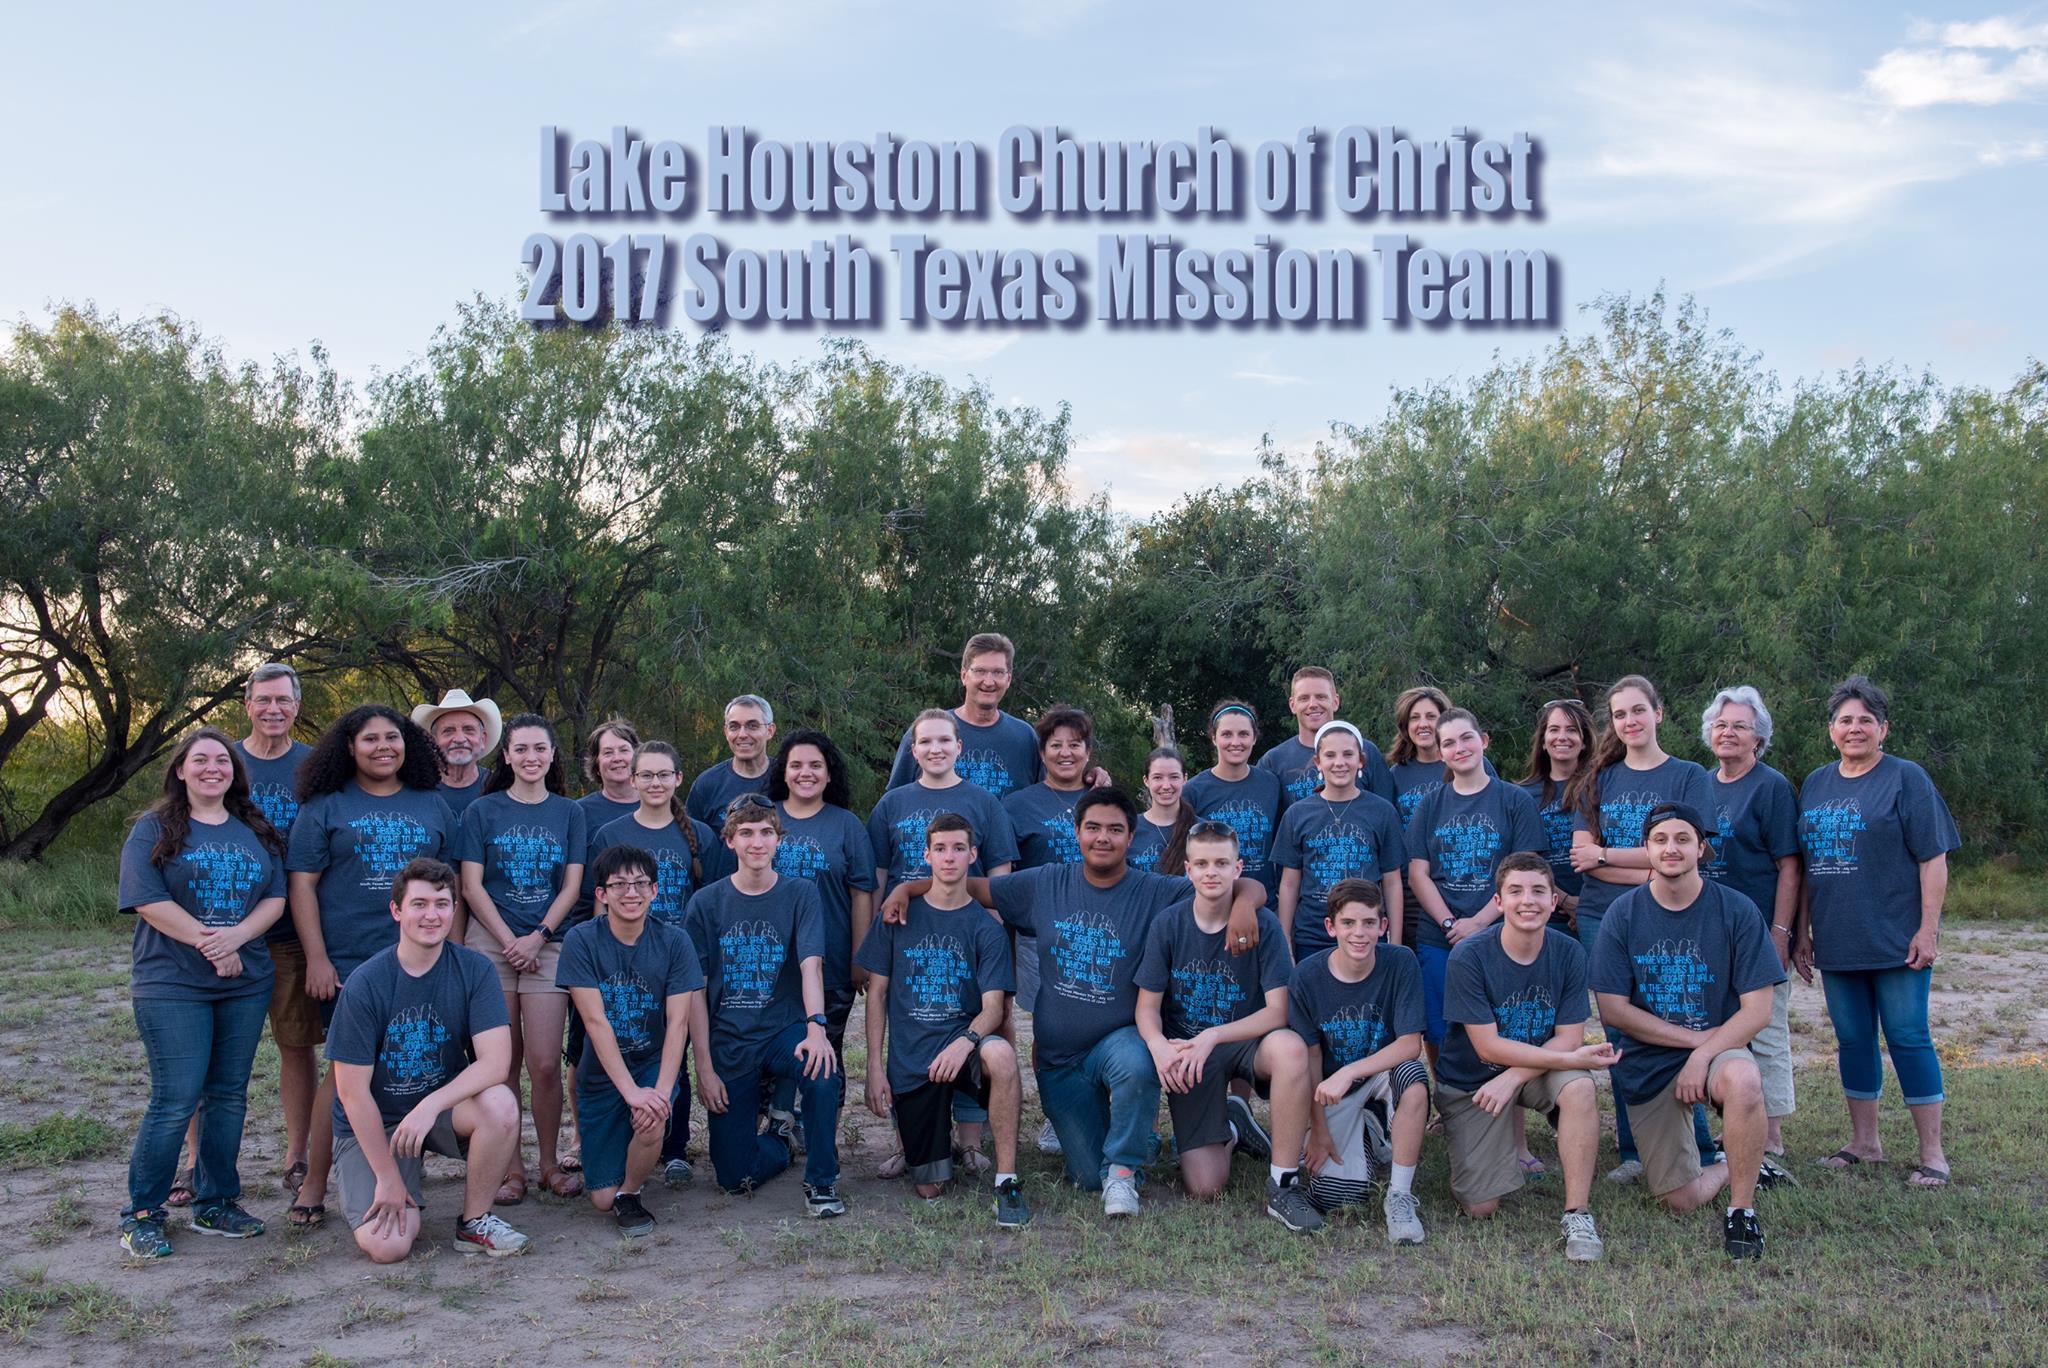 South Texas Mission Trip 2017